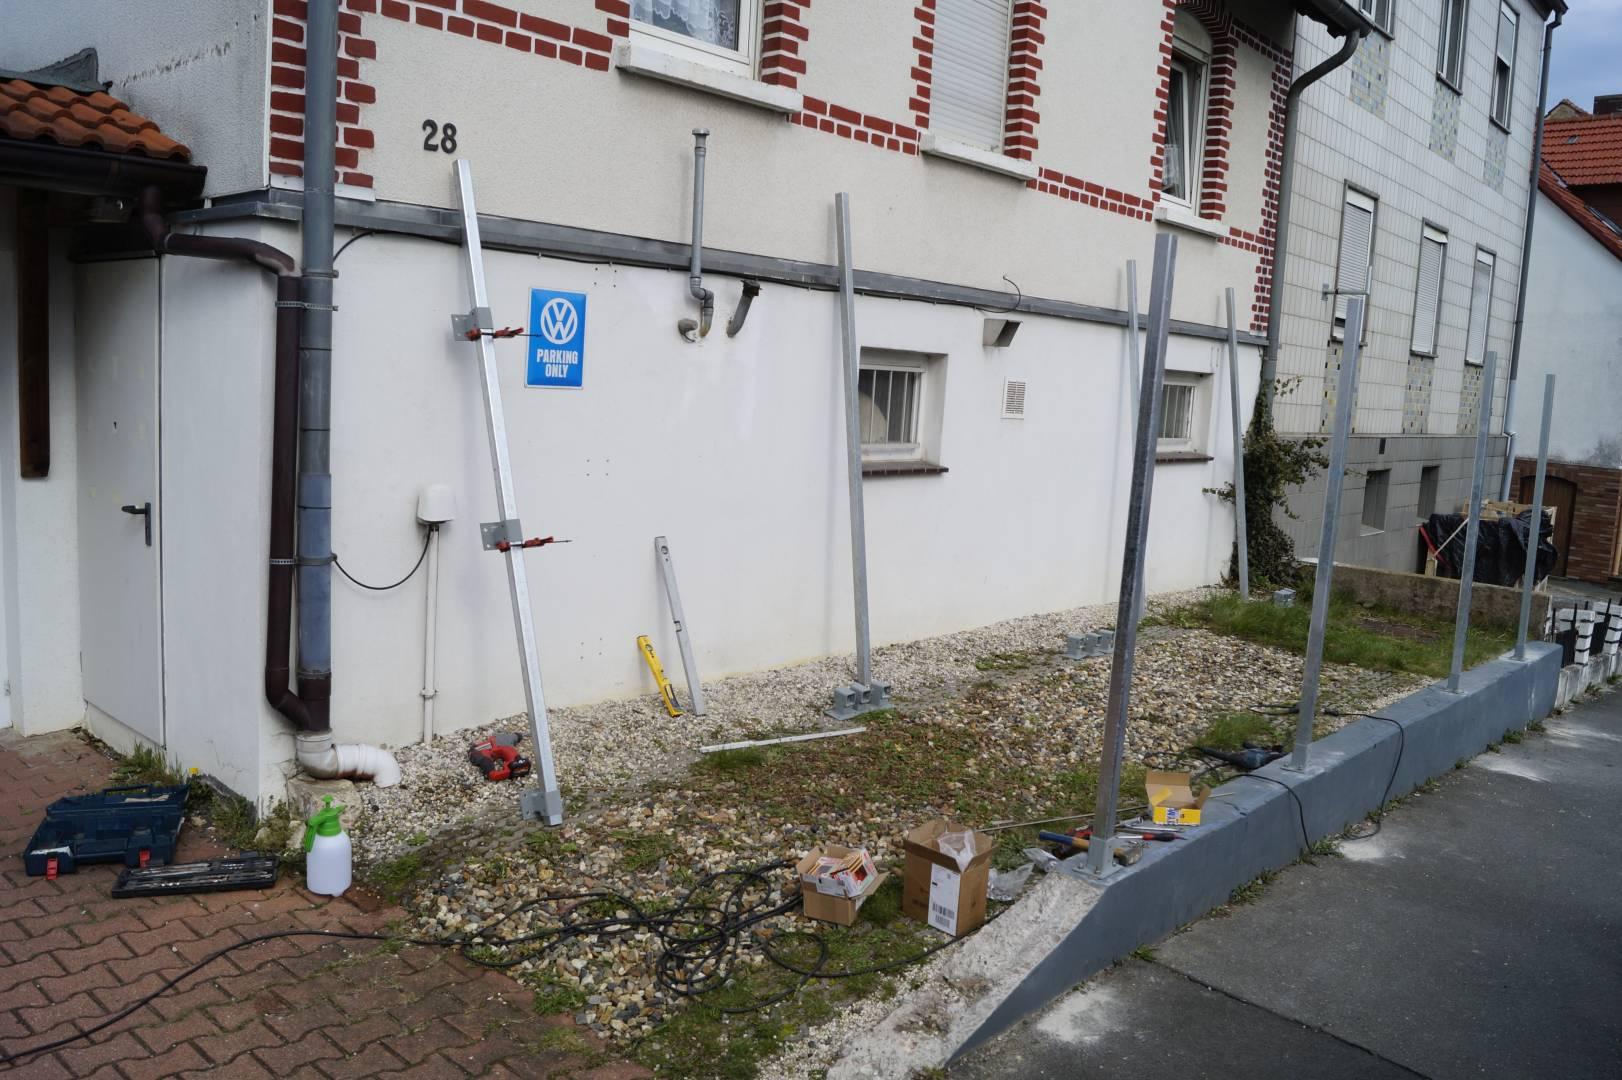 Carport_Aufbau_A05.jpg